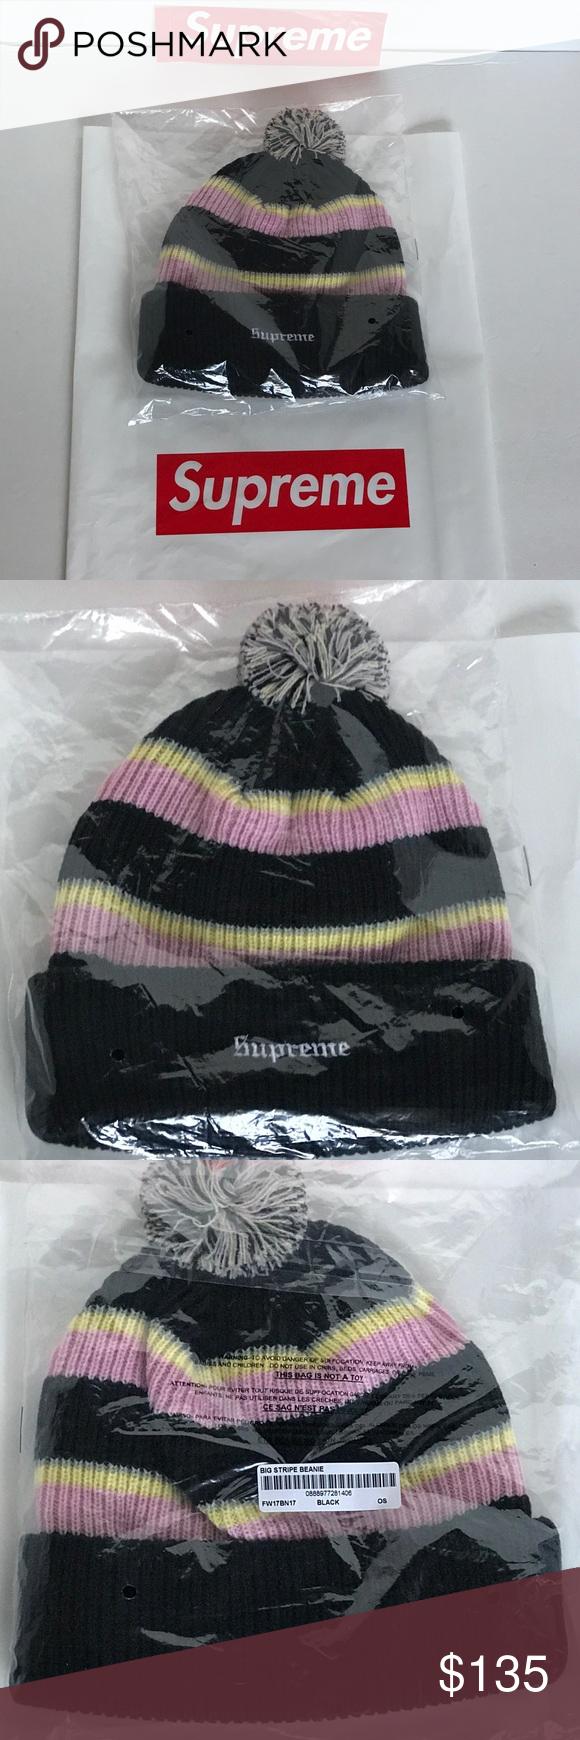 85a103513b043 SUPREME Big Stripe Beanie Black Pink Os 100% Authentic Brand New ...